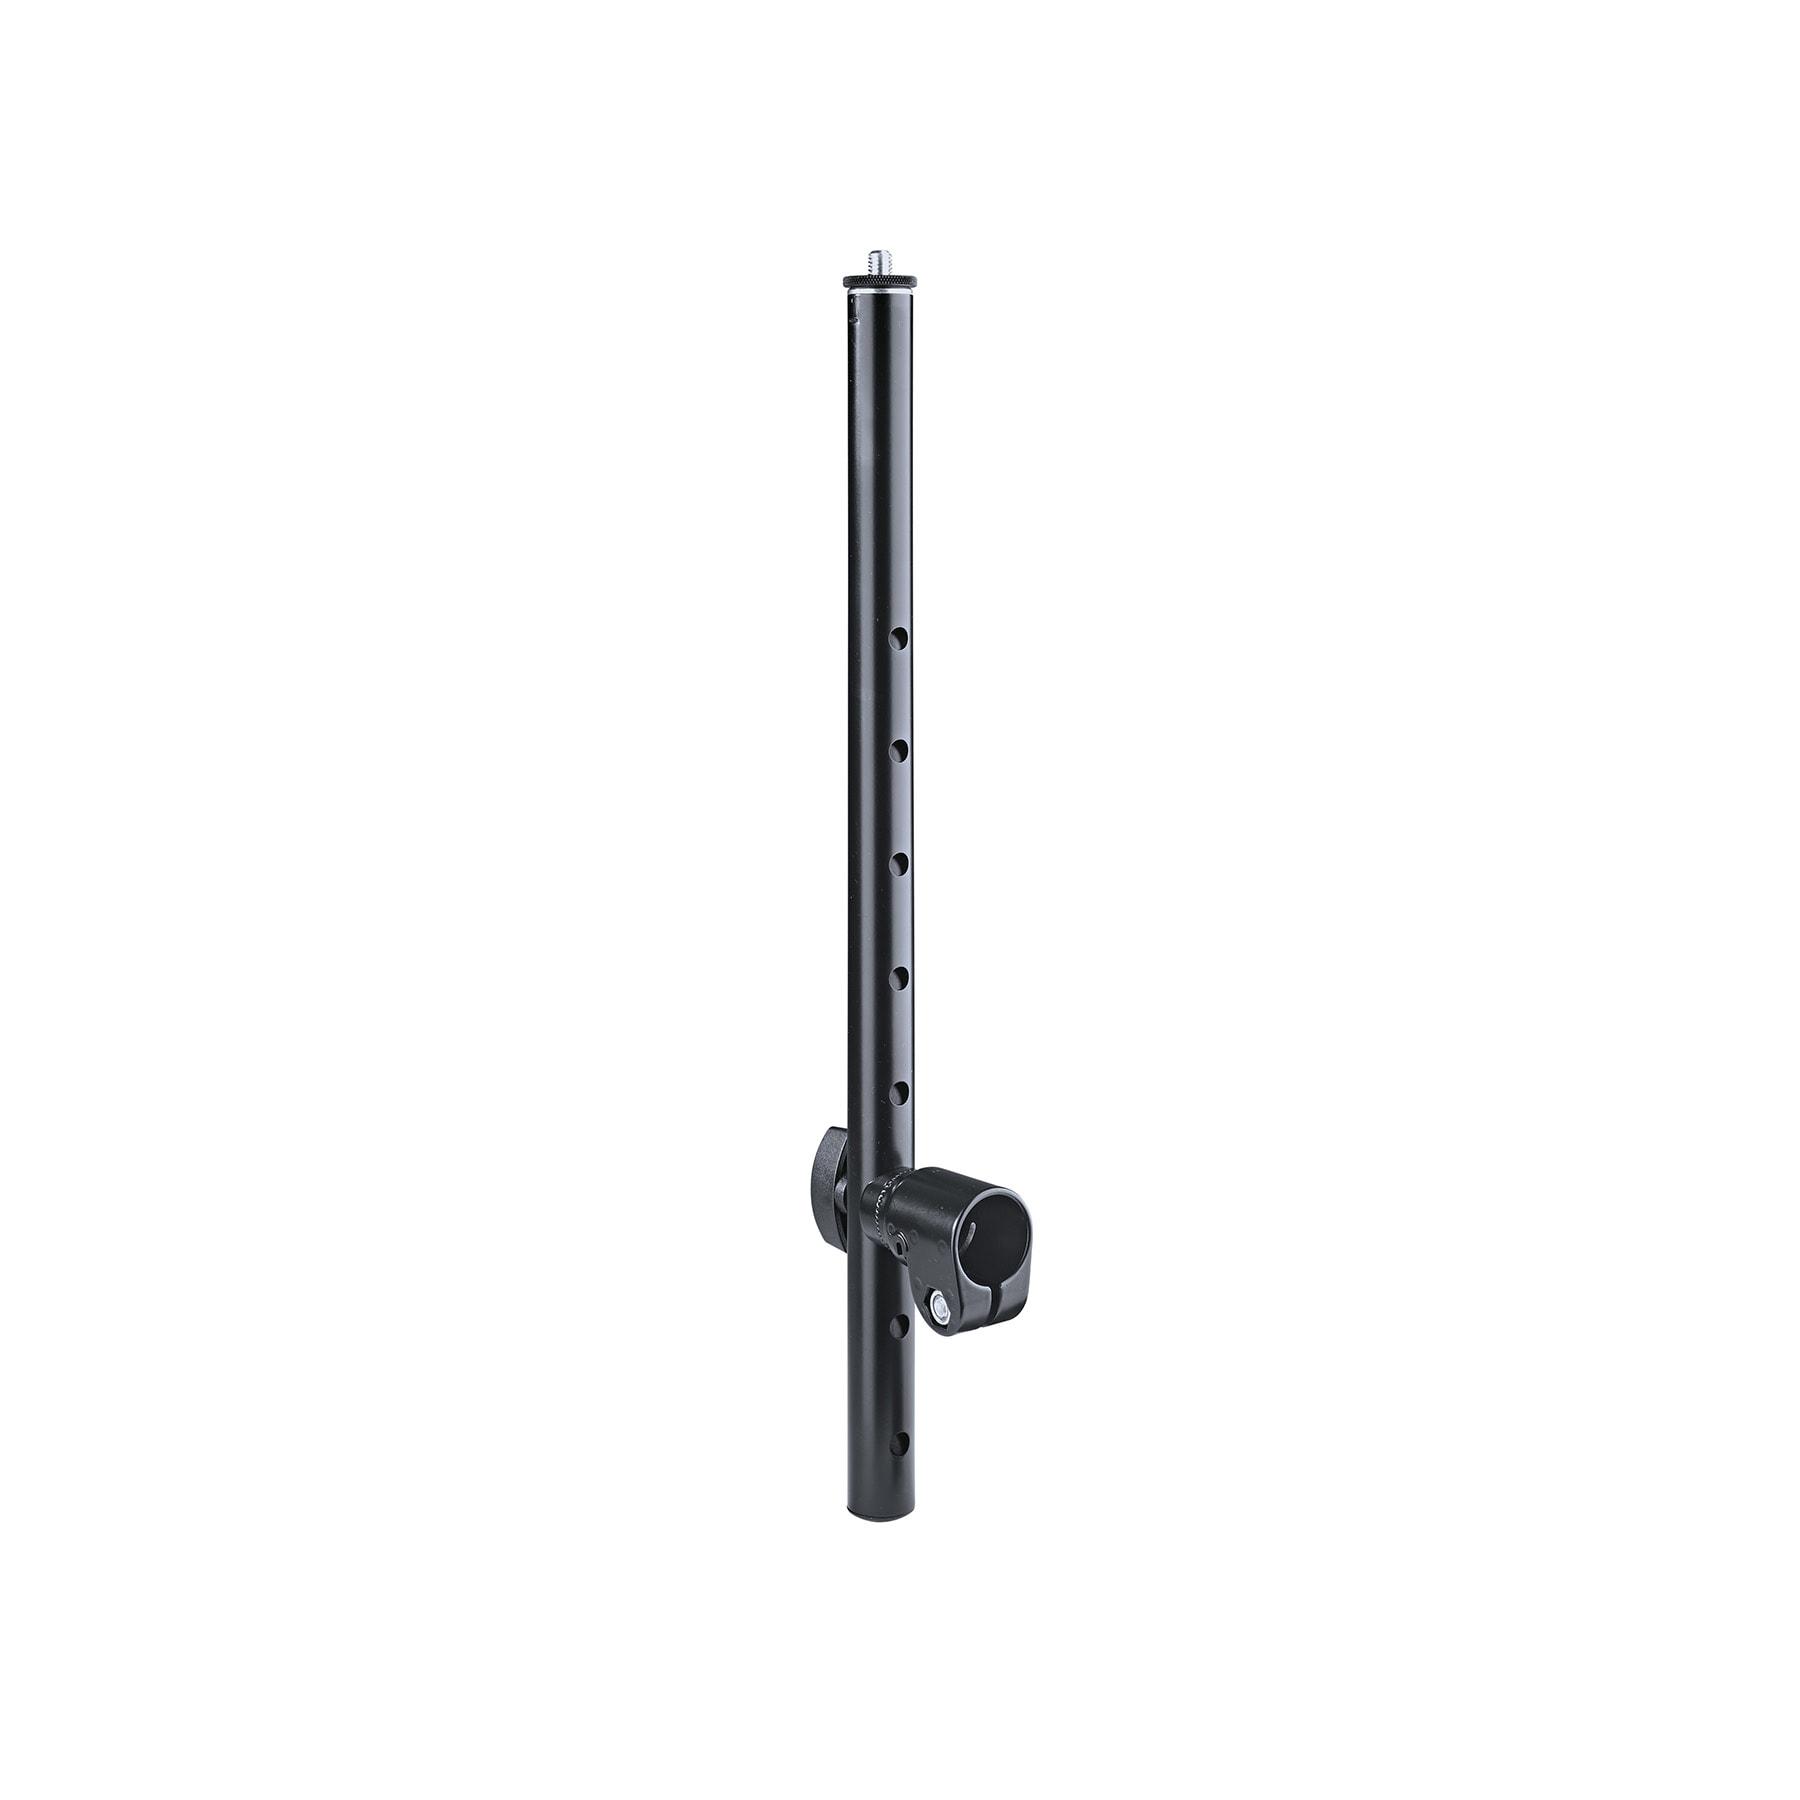 KM18944 - Universal holder